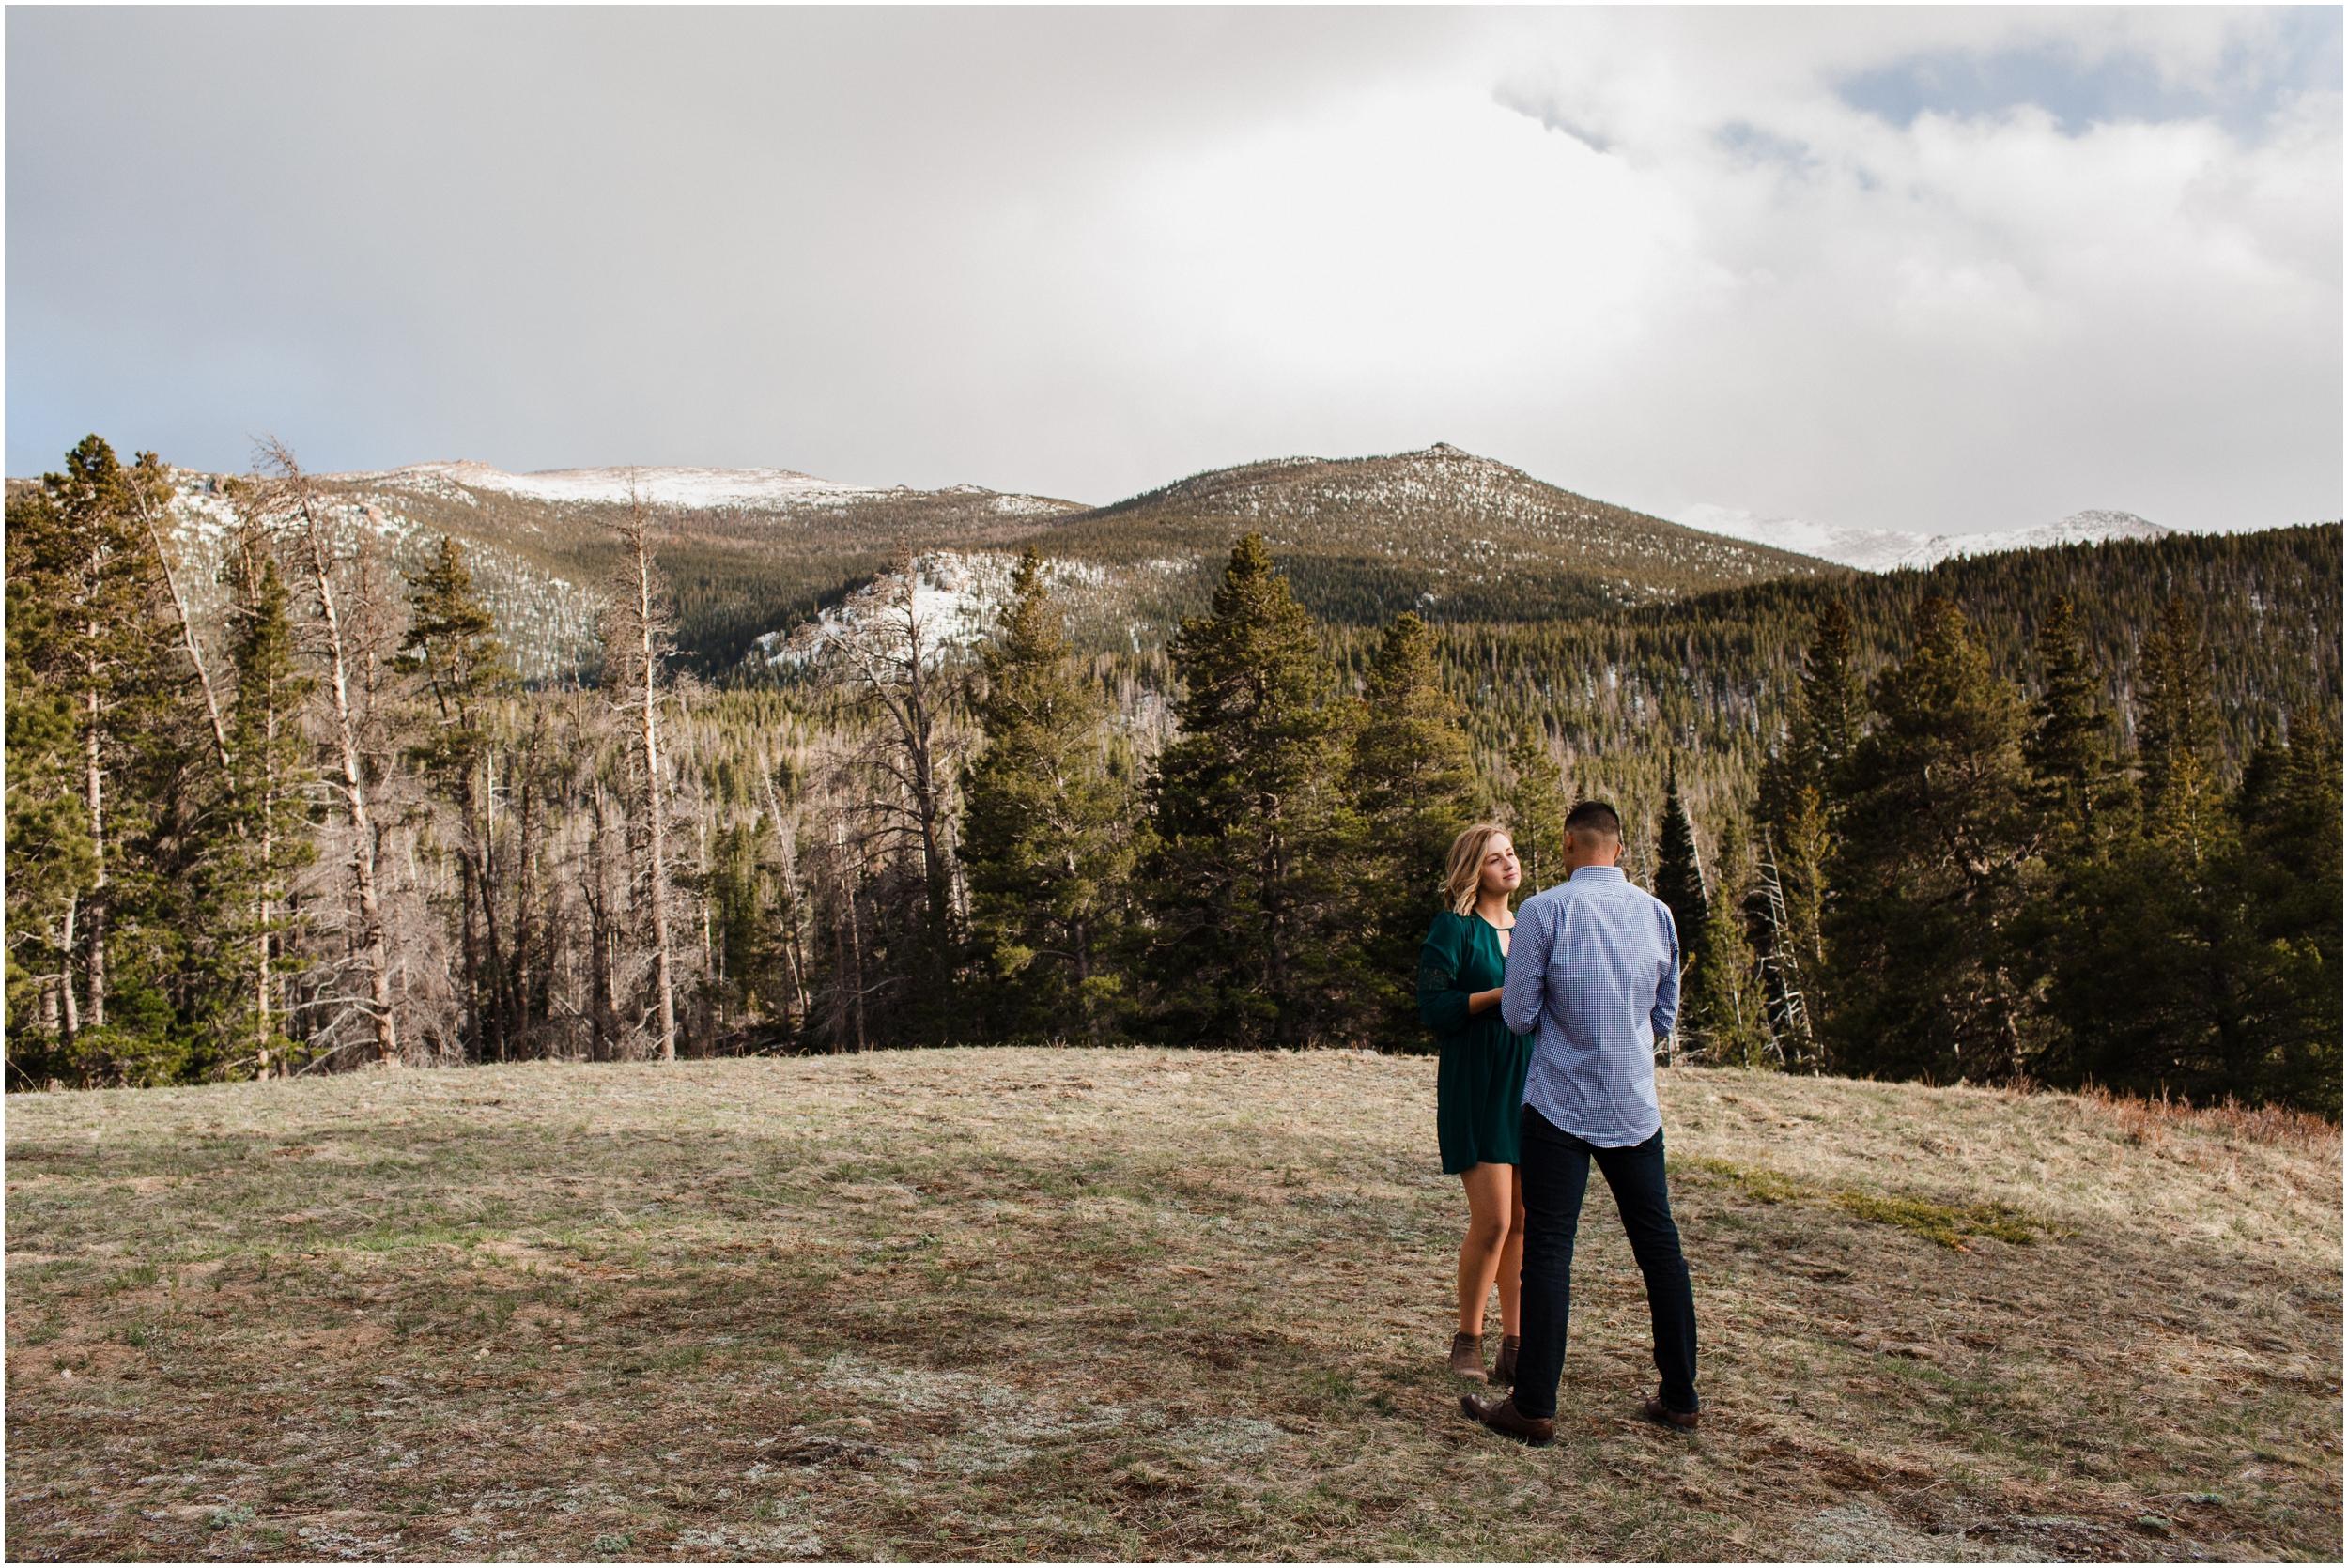 rocky-mountain-national-park-elopement-sprague-lake-colorado-adventure-wedding-photographer_taylor-powers_67.jpg